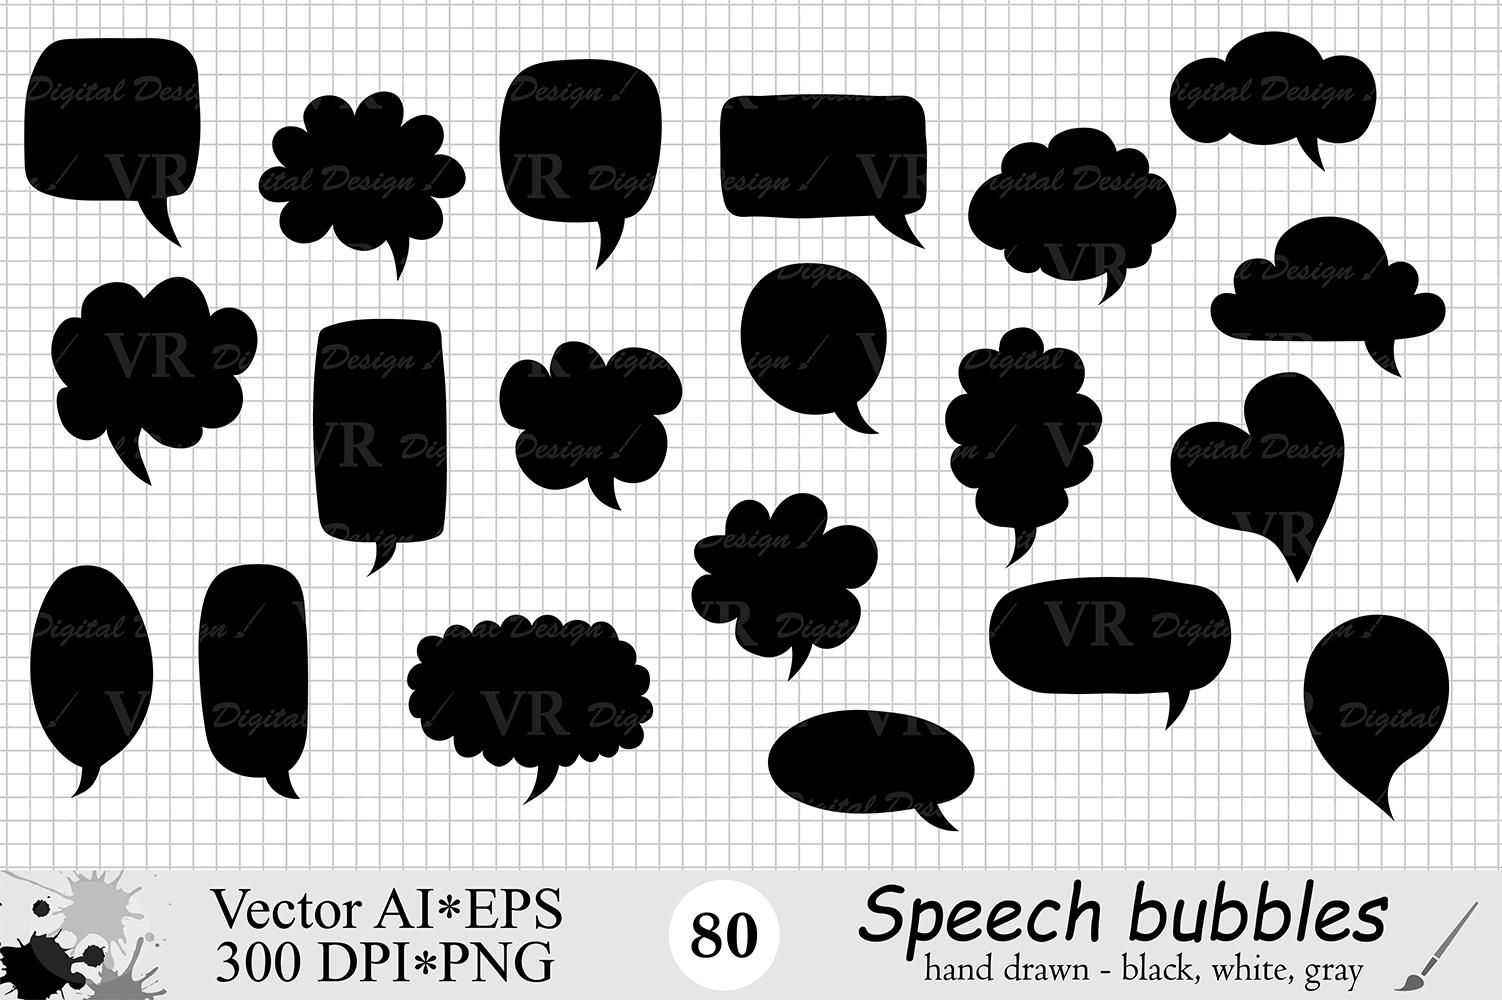 Speech Bubbles Clipart / Chat Bubbles / Hand drawn Text bubbles / Black, White, Gray - Vector example image 2